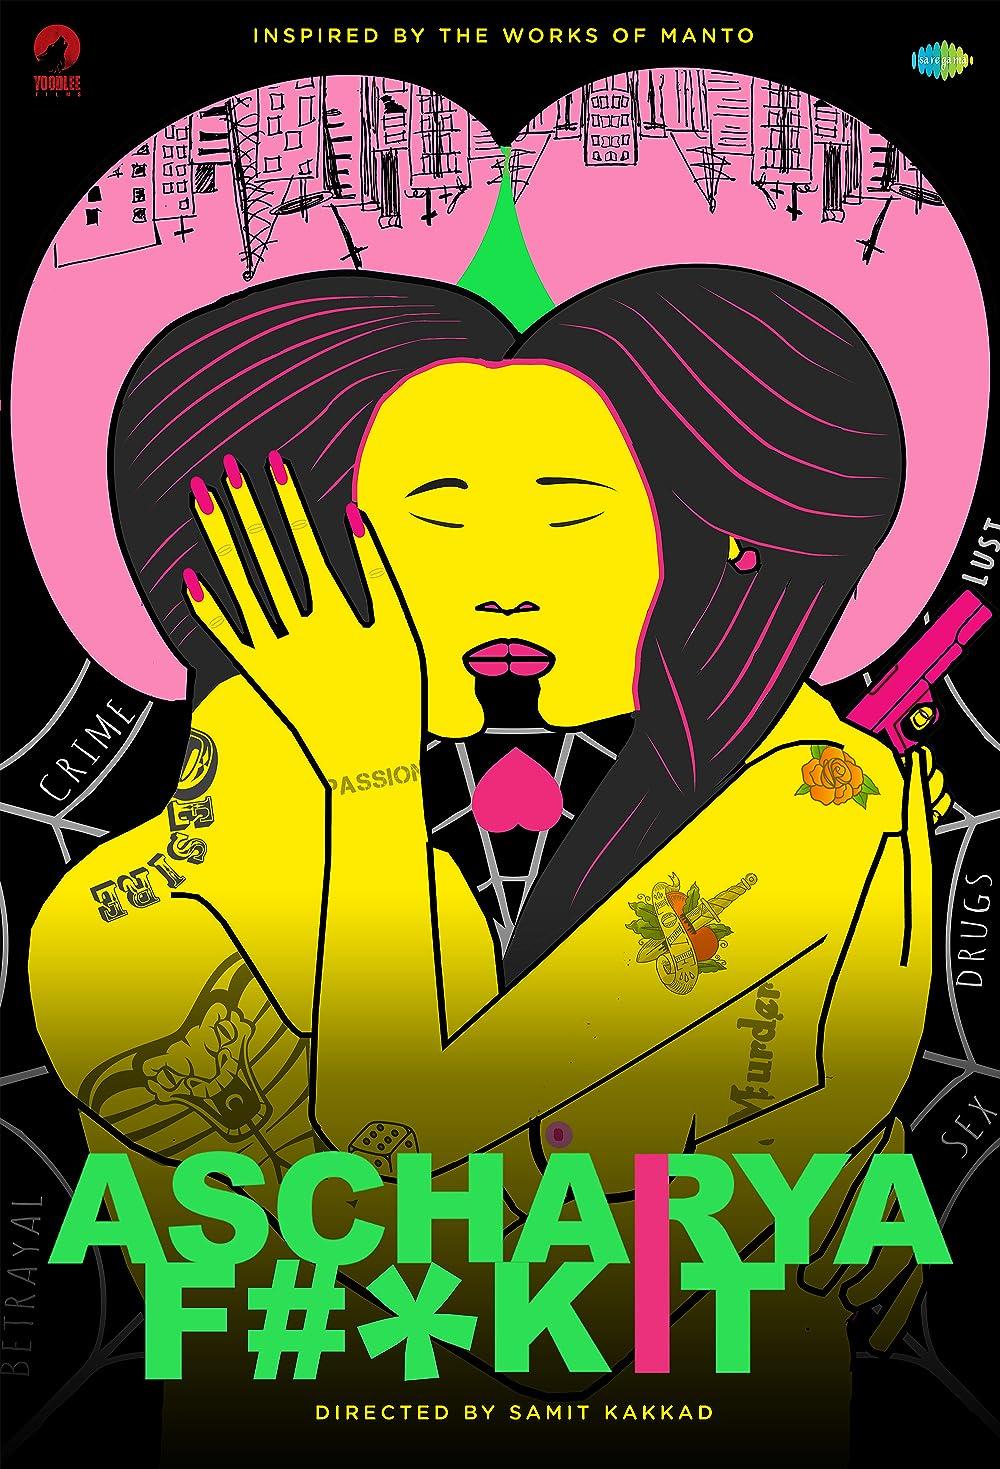 Download 18+ Ascharya Fk It 2018 Hindi 480p UNRATED HDRip ESubs 300MB